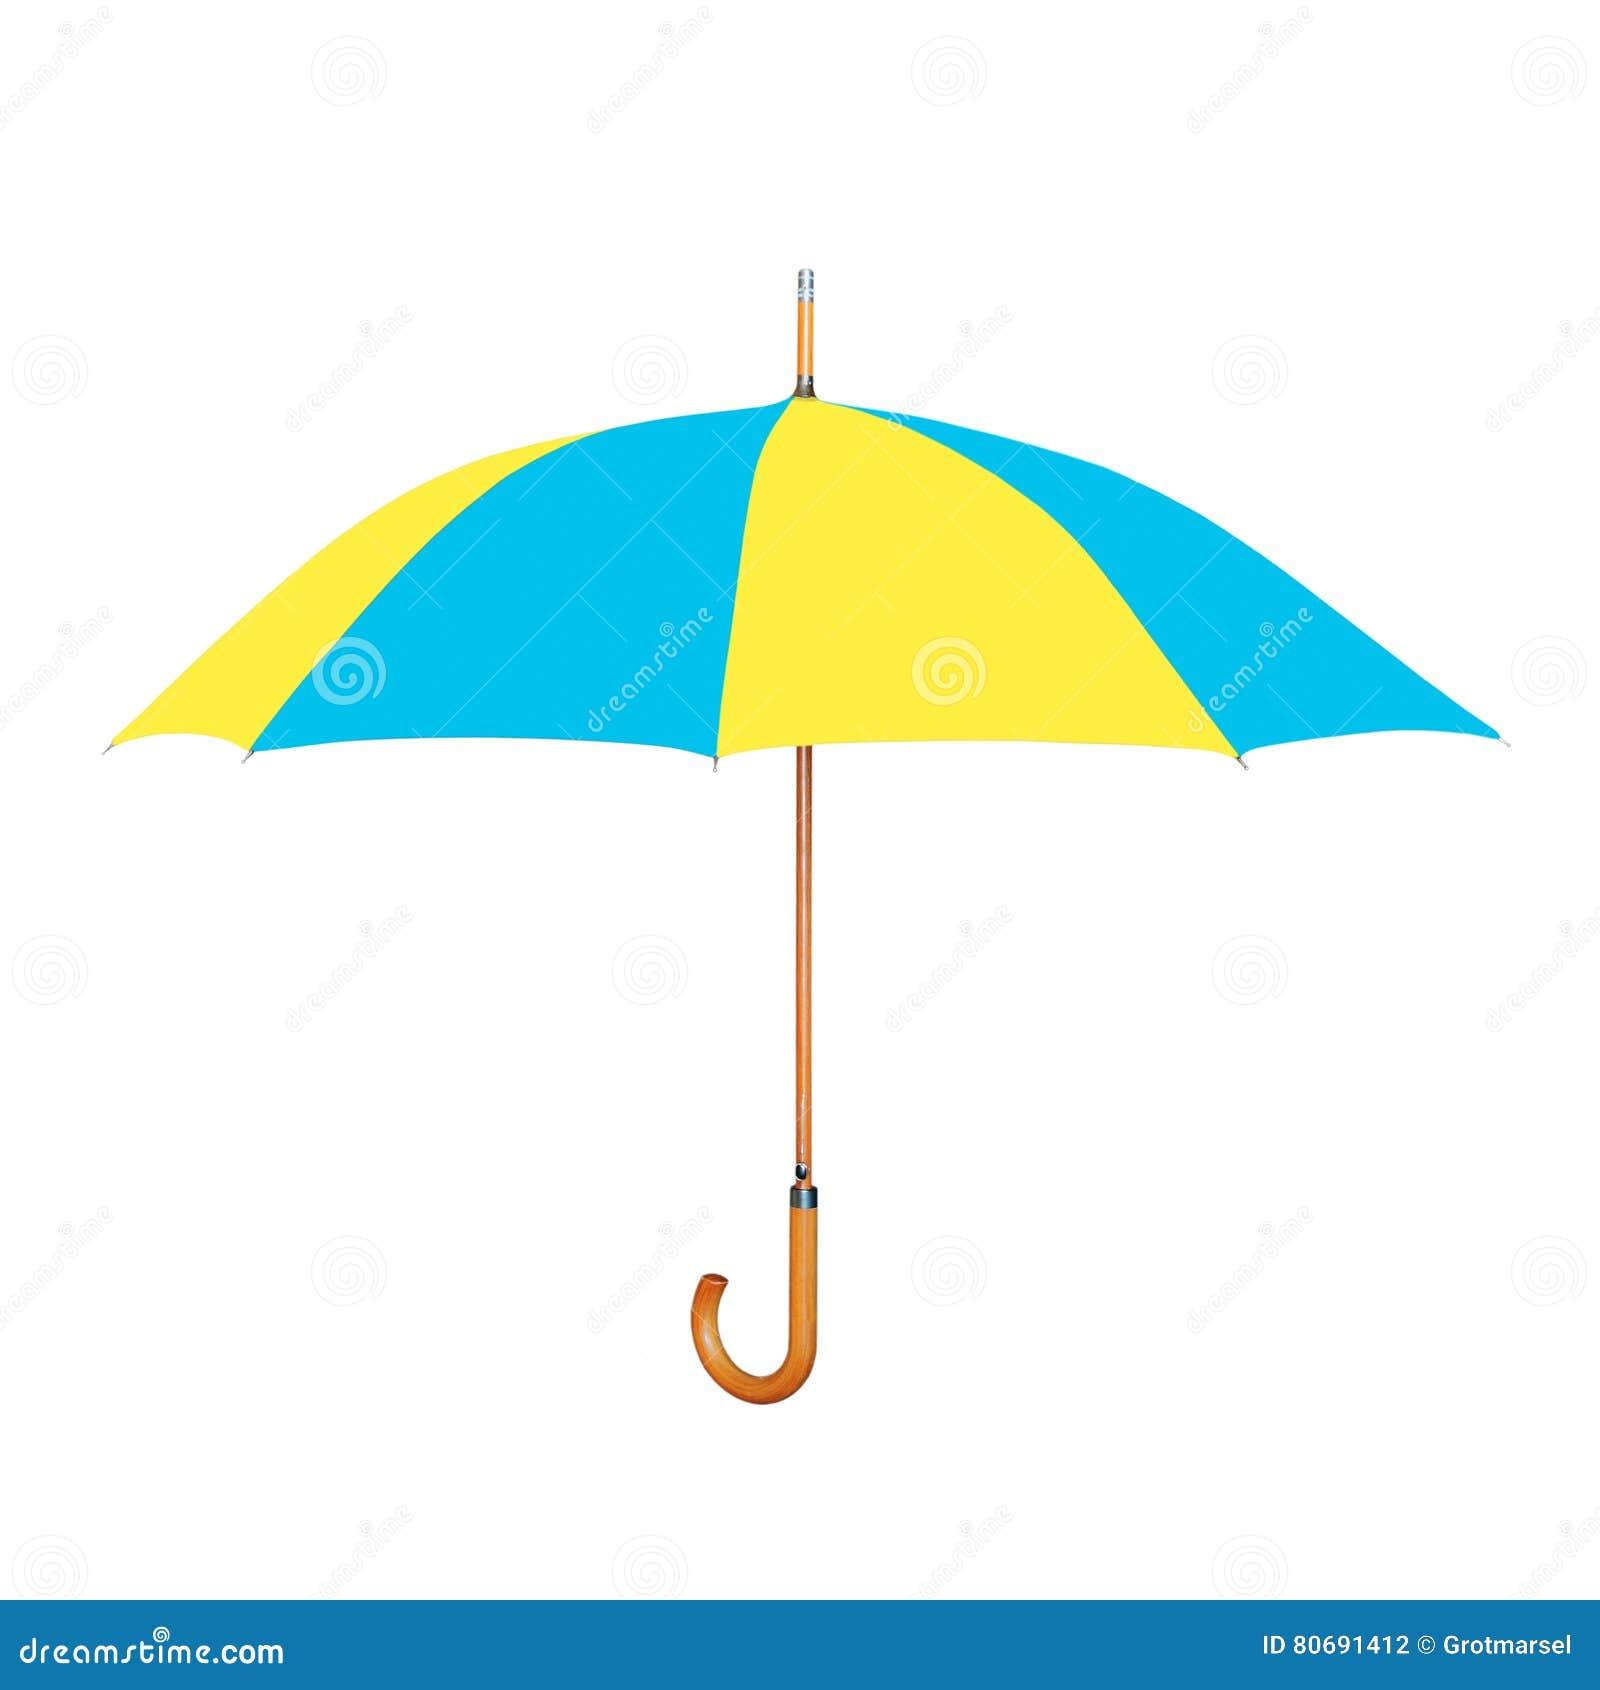 modern umbrella - modern umbrella in ukrainian flag colors isolated on white stock